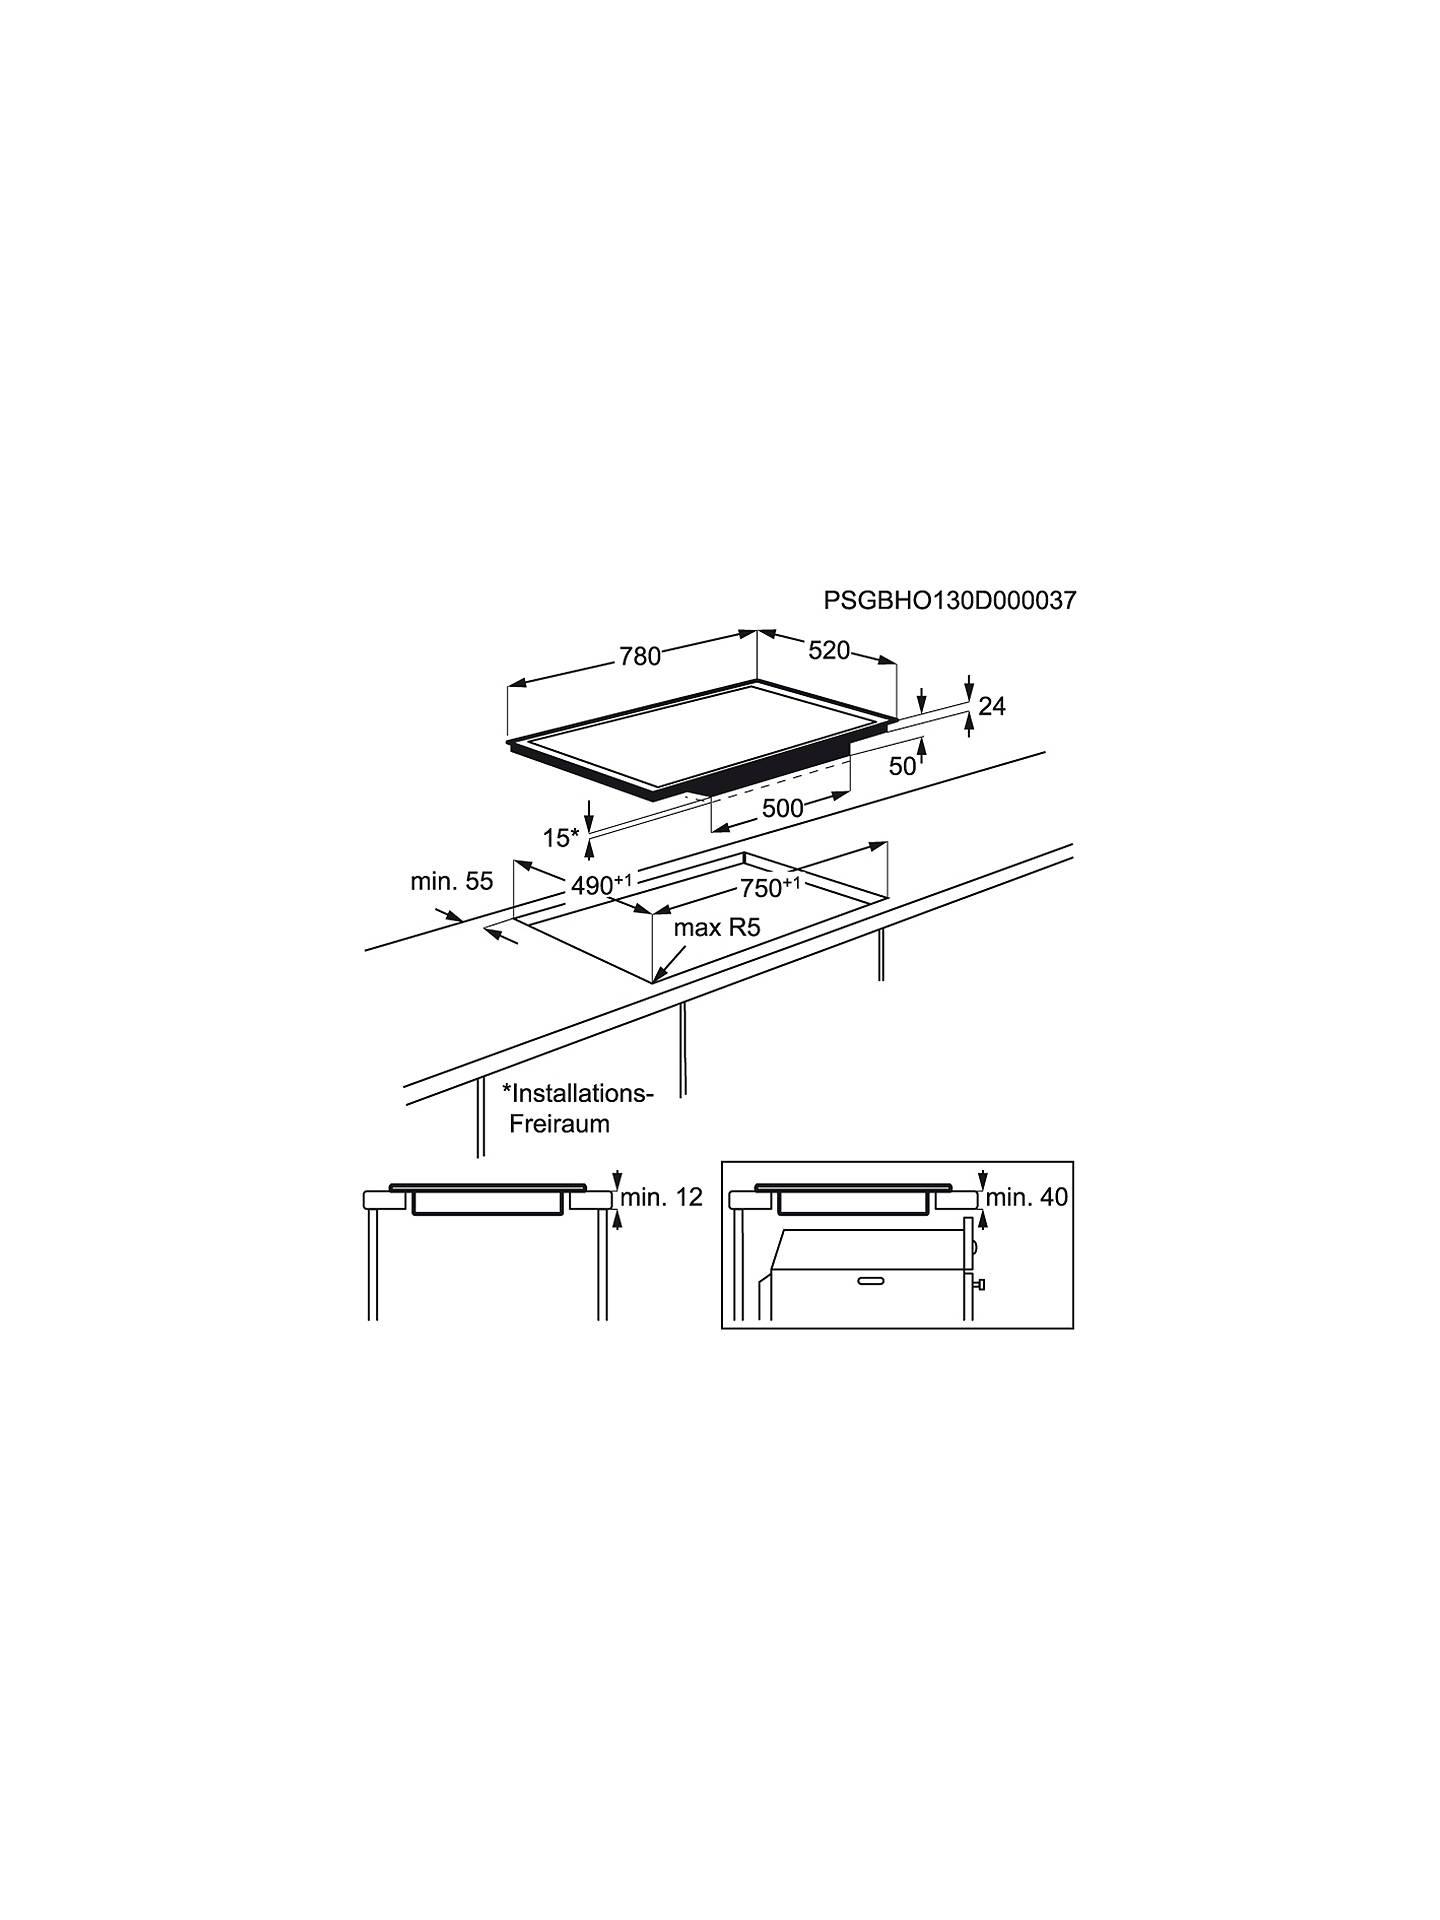 John Lewis Partners Jlbiih805 Induction Hob Black At Cooker Circuit Diagram Buyjohn Online